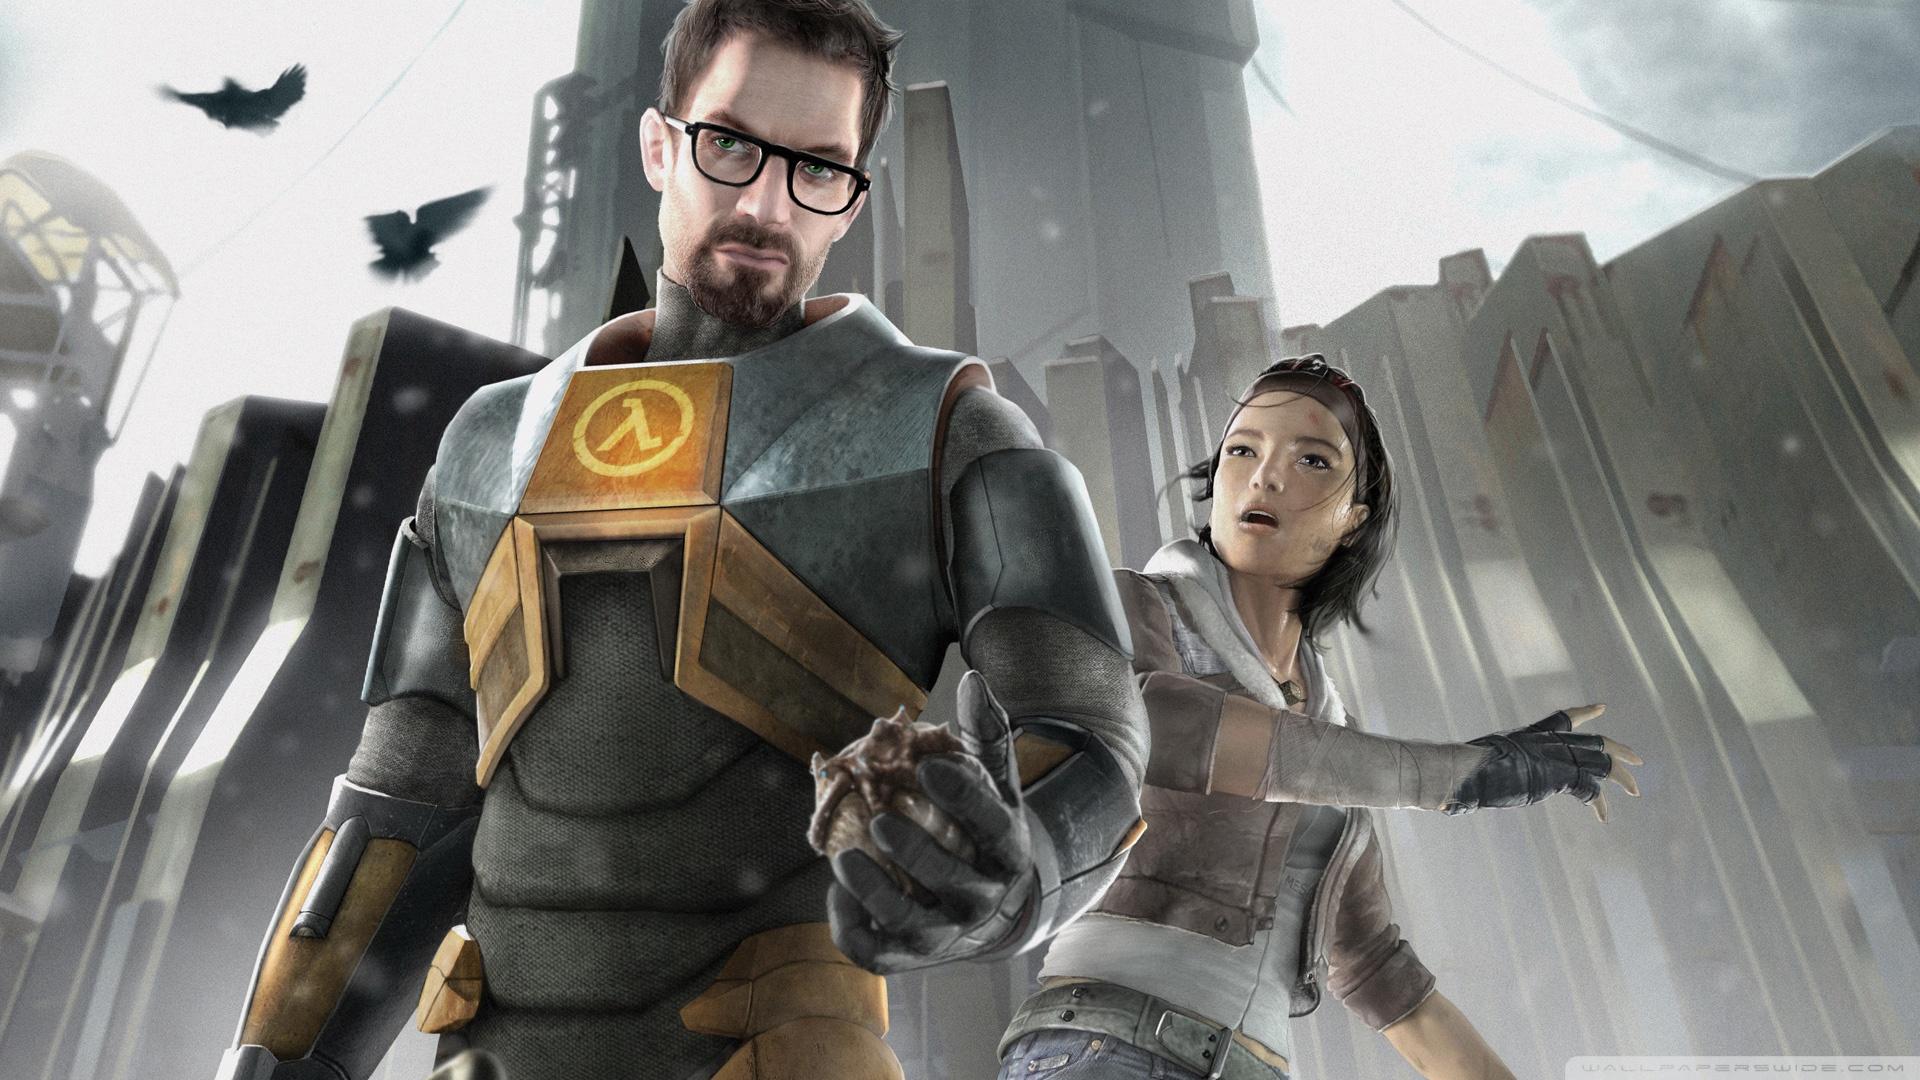 Download Half Life 2 Gordon And Alyx Wallpaper 1920x1080 1920x1080